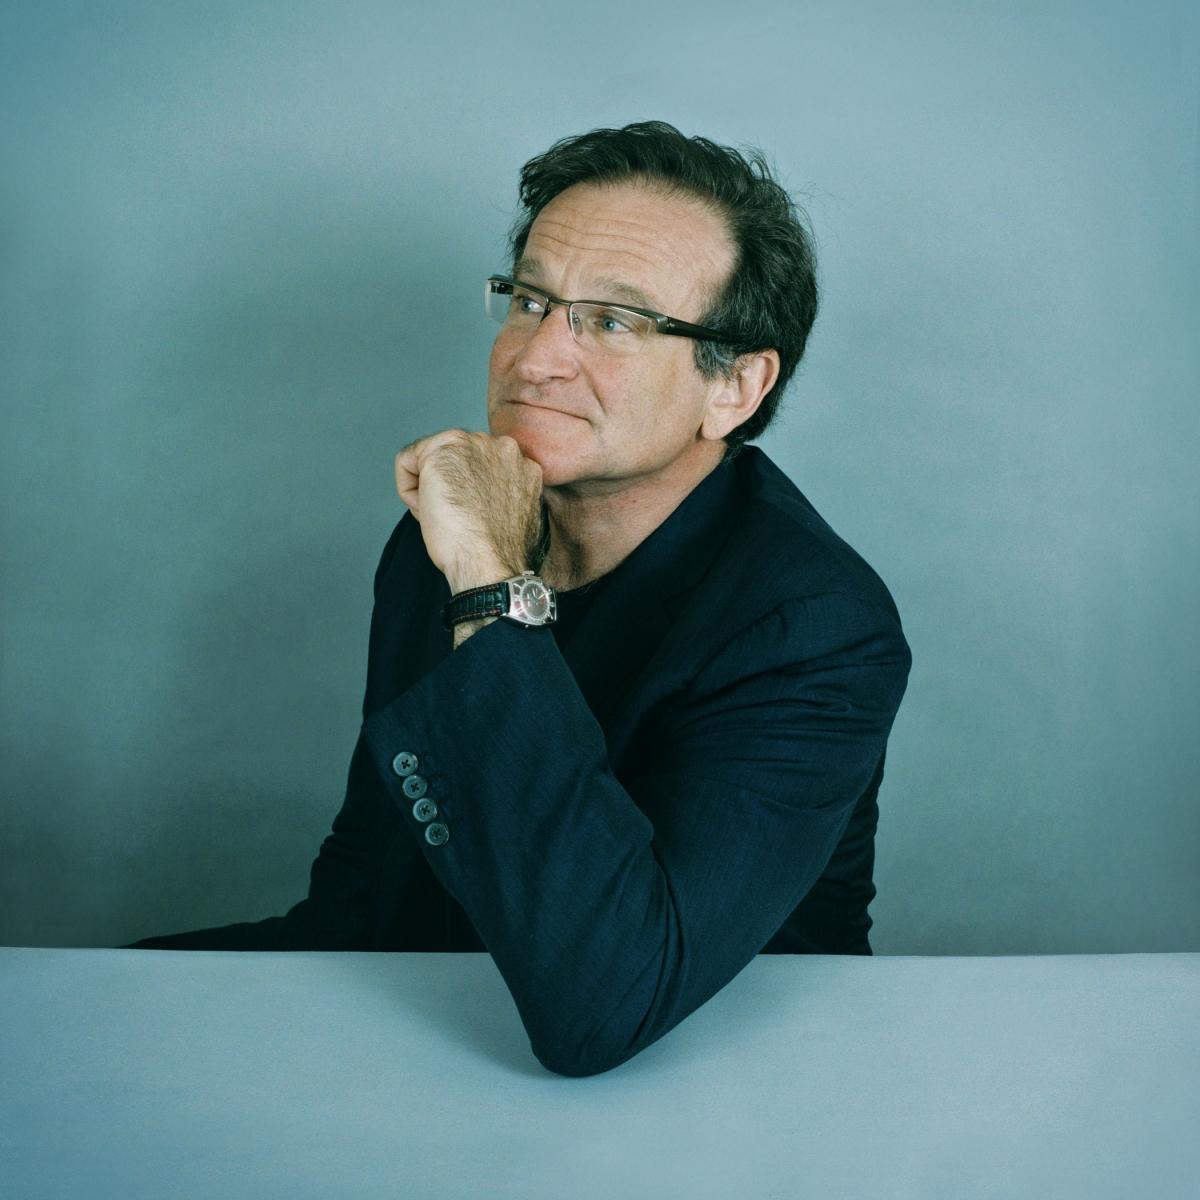 Робин Уильямс (Robin Williams) - фото №5